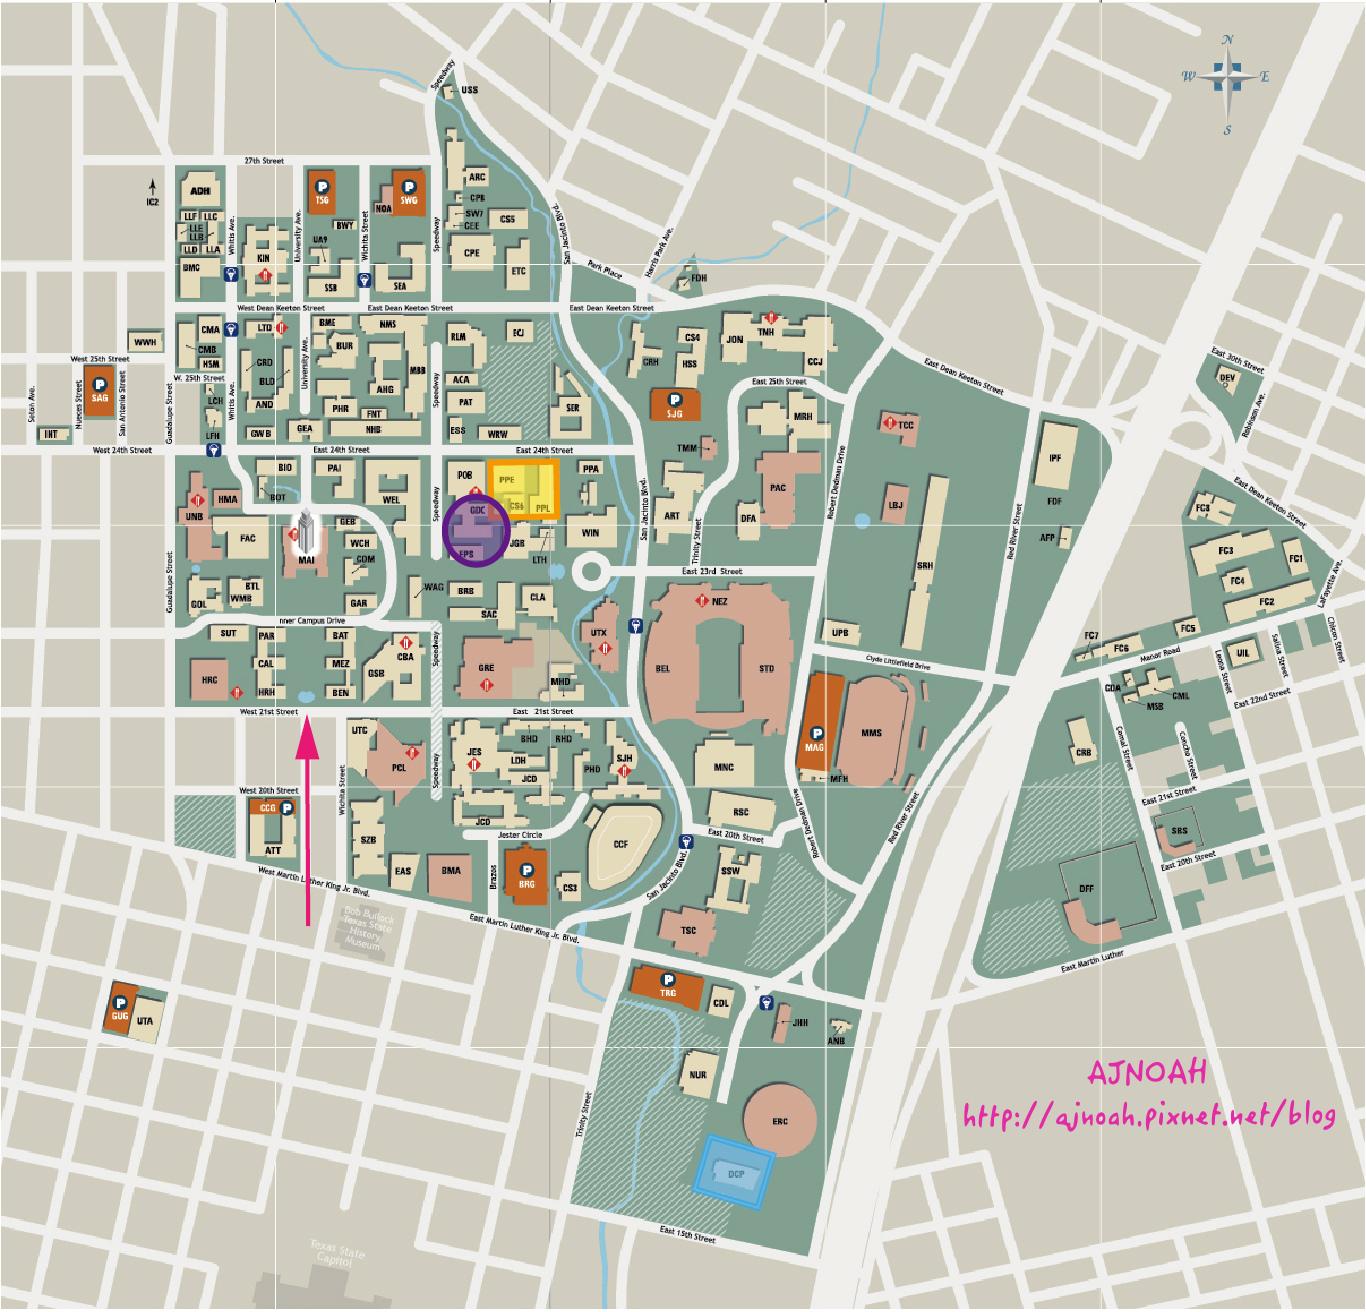 UT-Austin德州大學奧斯汀分校 - 位於德州政經中心,高科技企業愛攬才